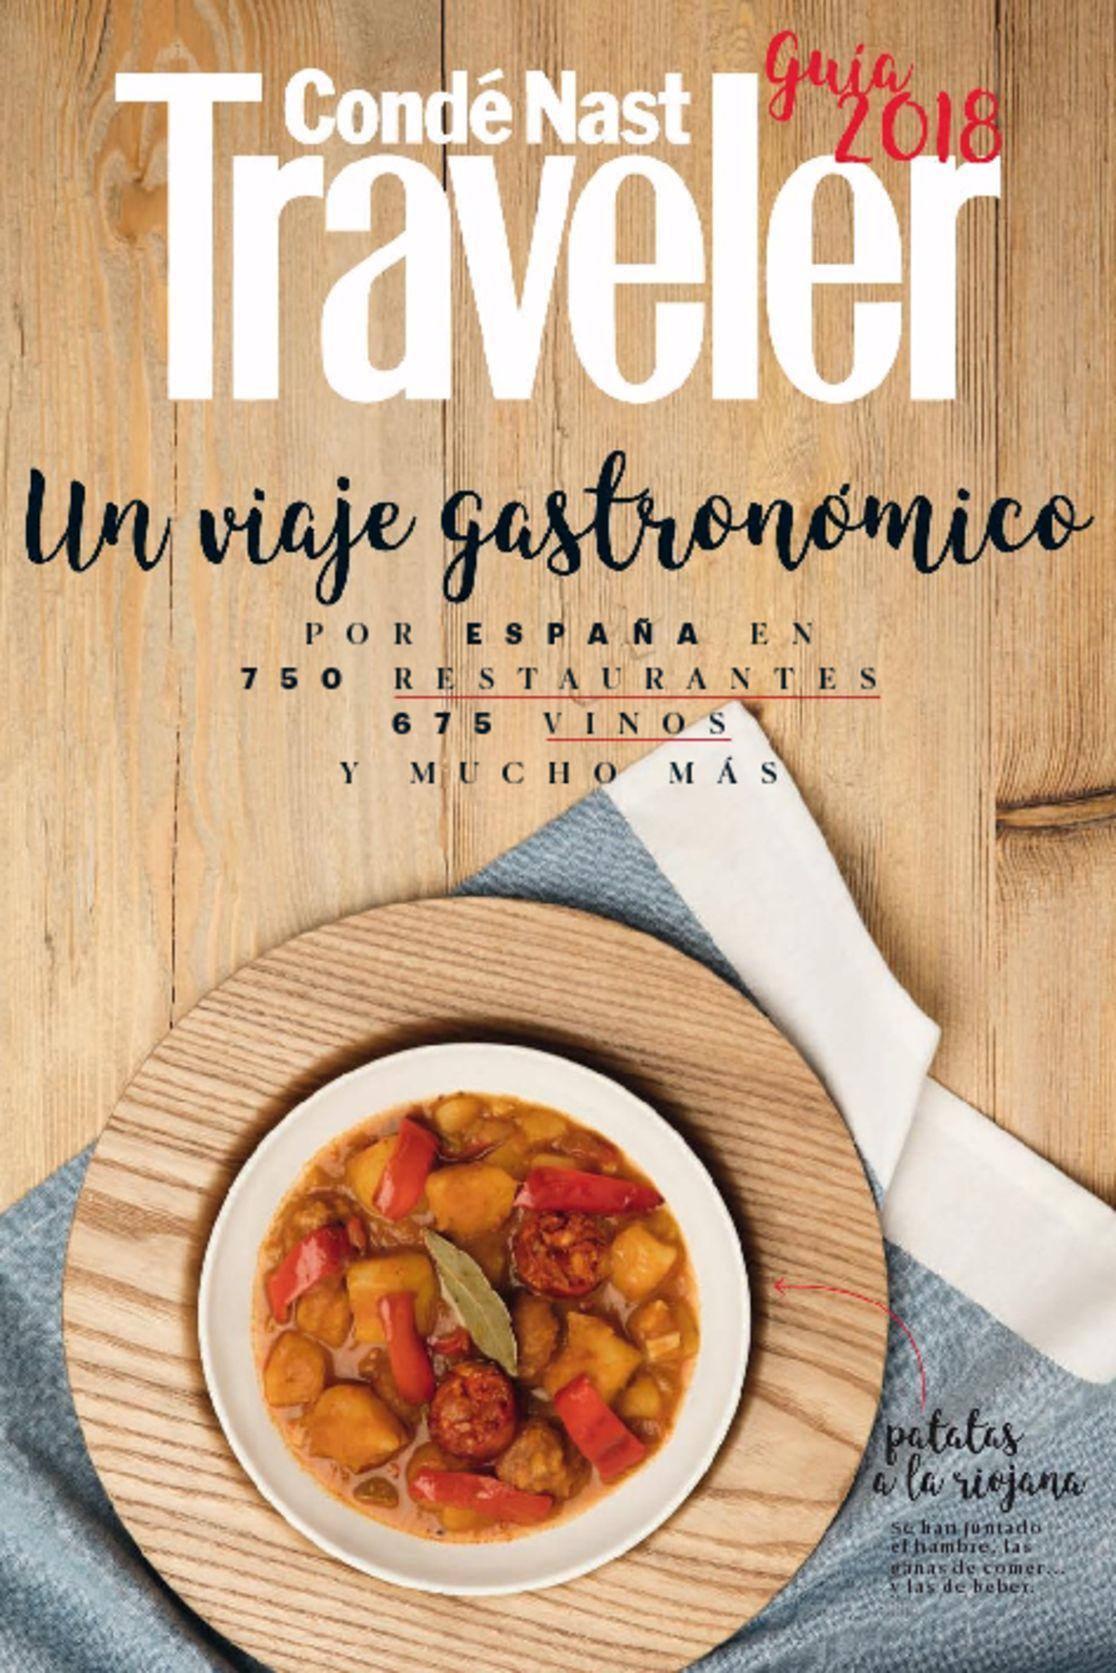 Condé Nast Traveler GUÍA GASTRONÓMICA 2018 Digital